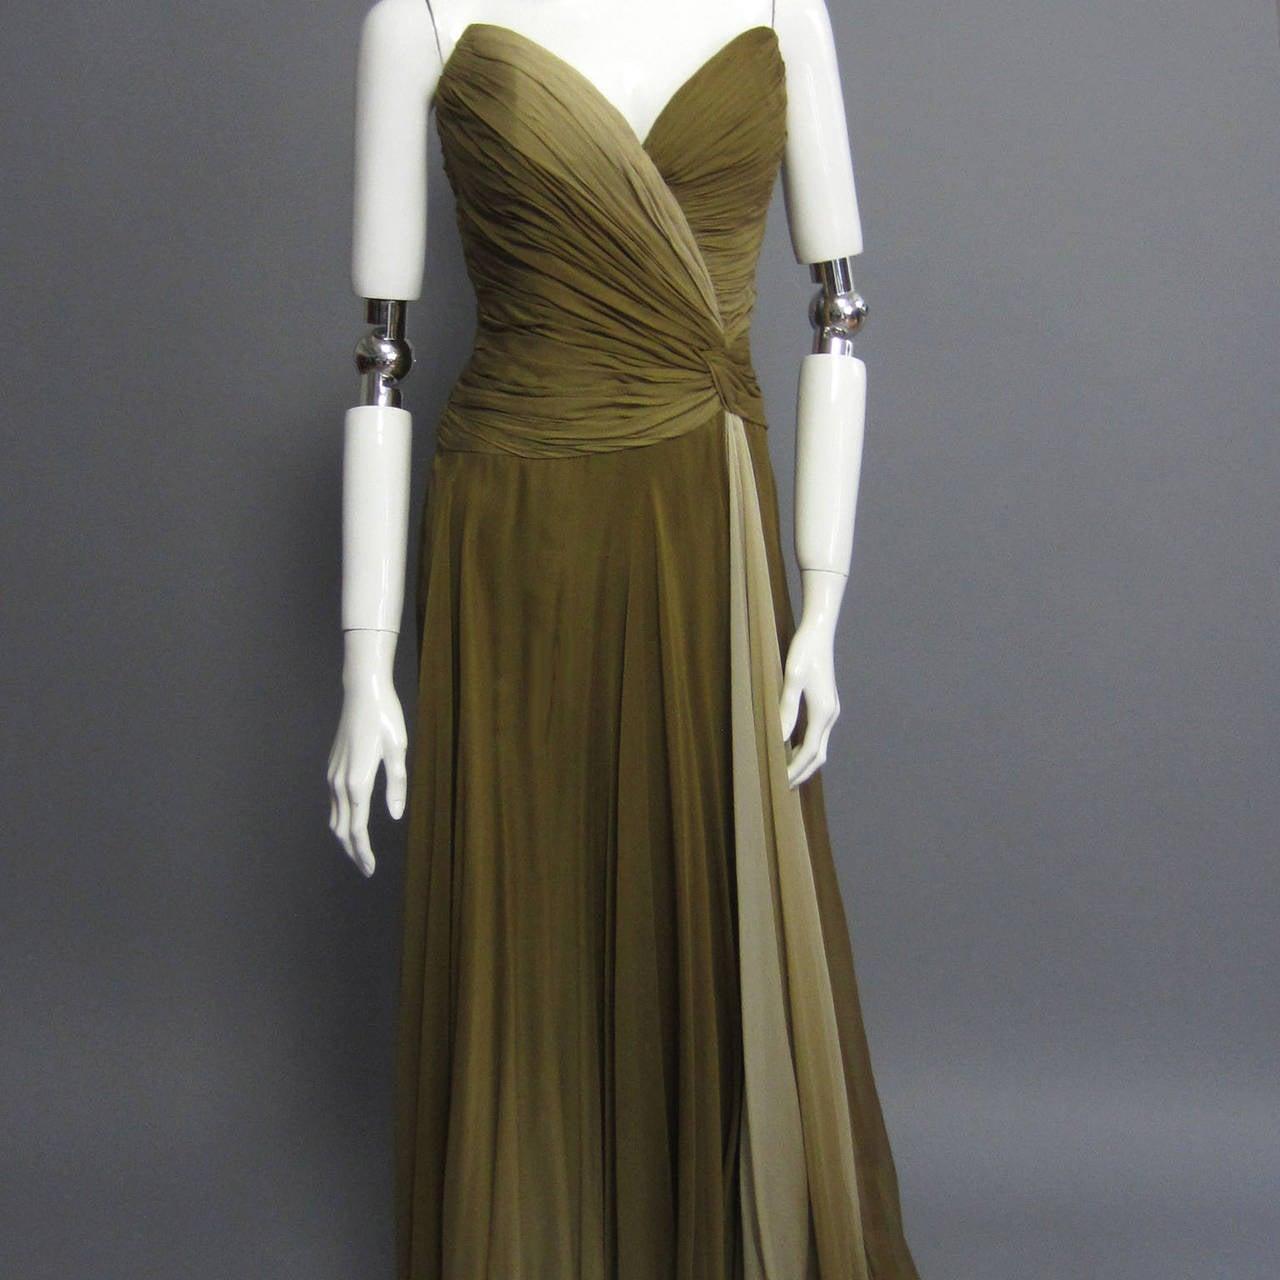 BOB MACKIE Ombre Chiffon Gown 5